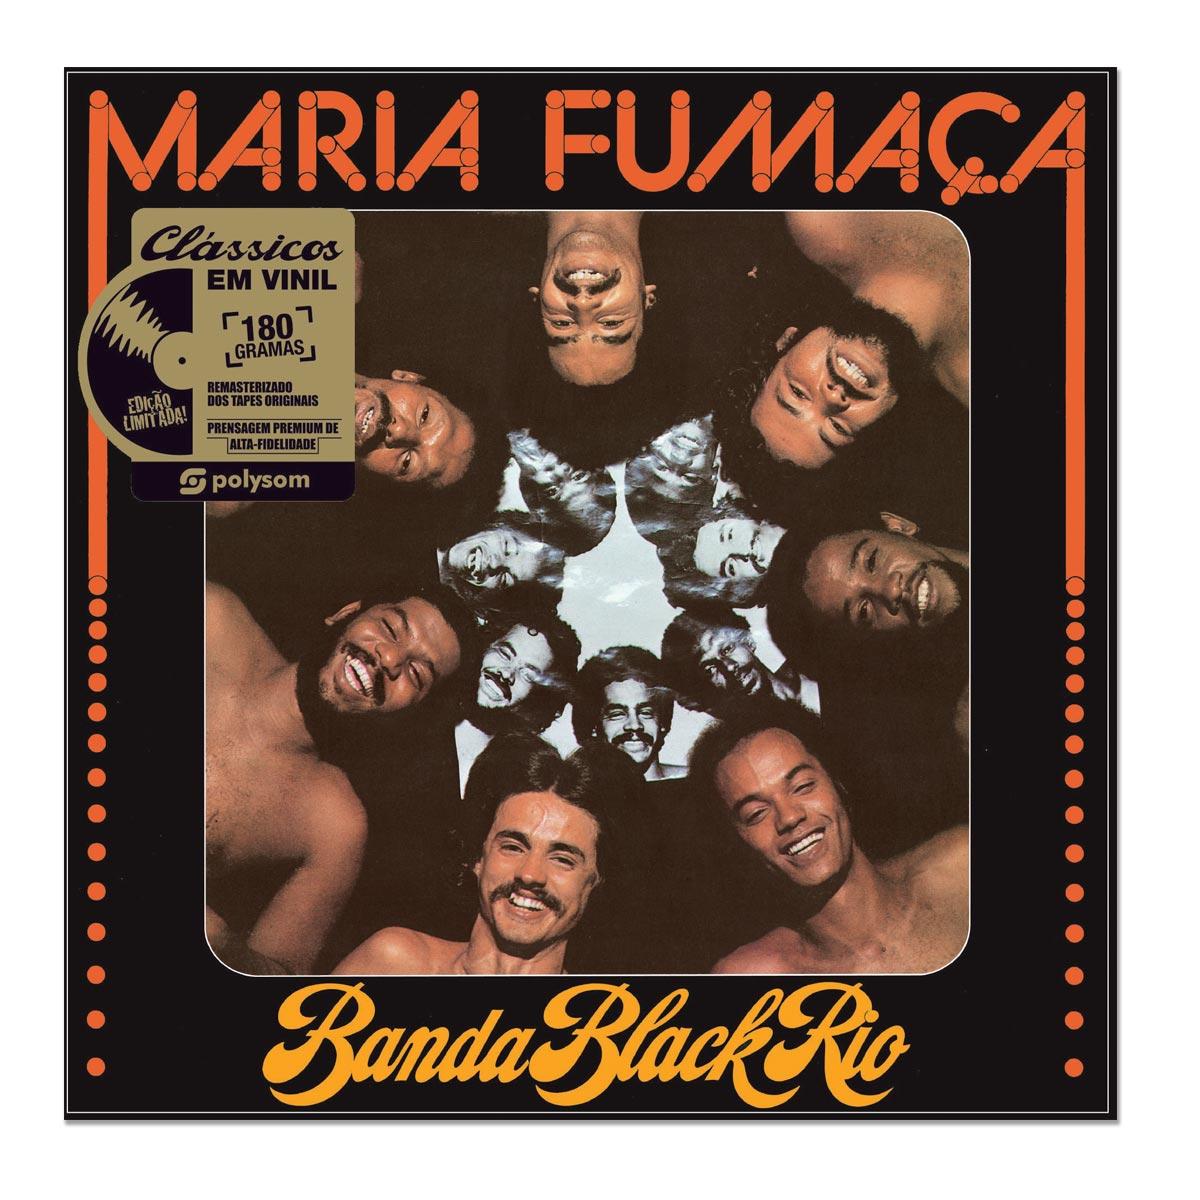 LP Banda Black Rio Maria Fumaça